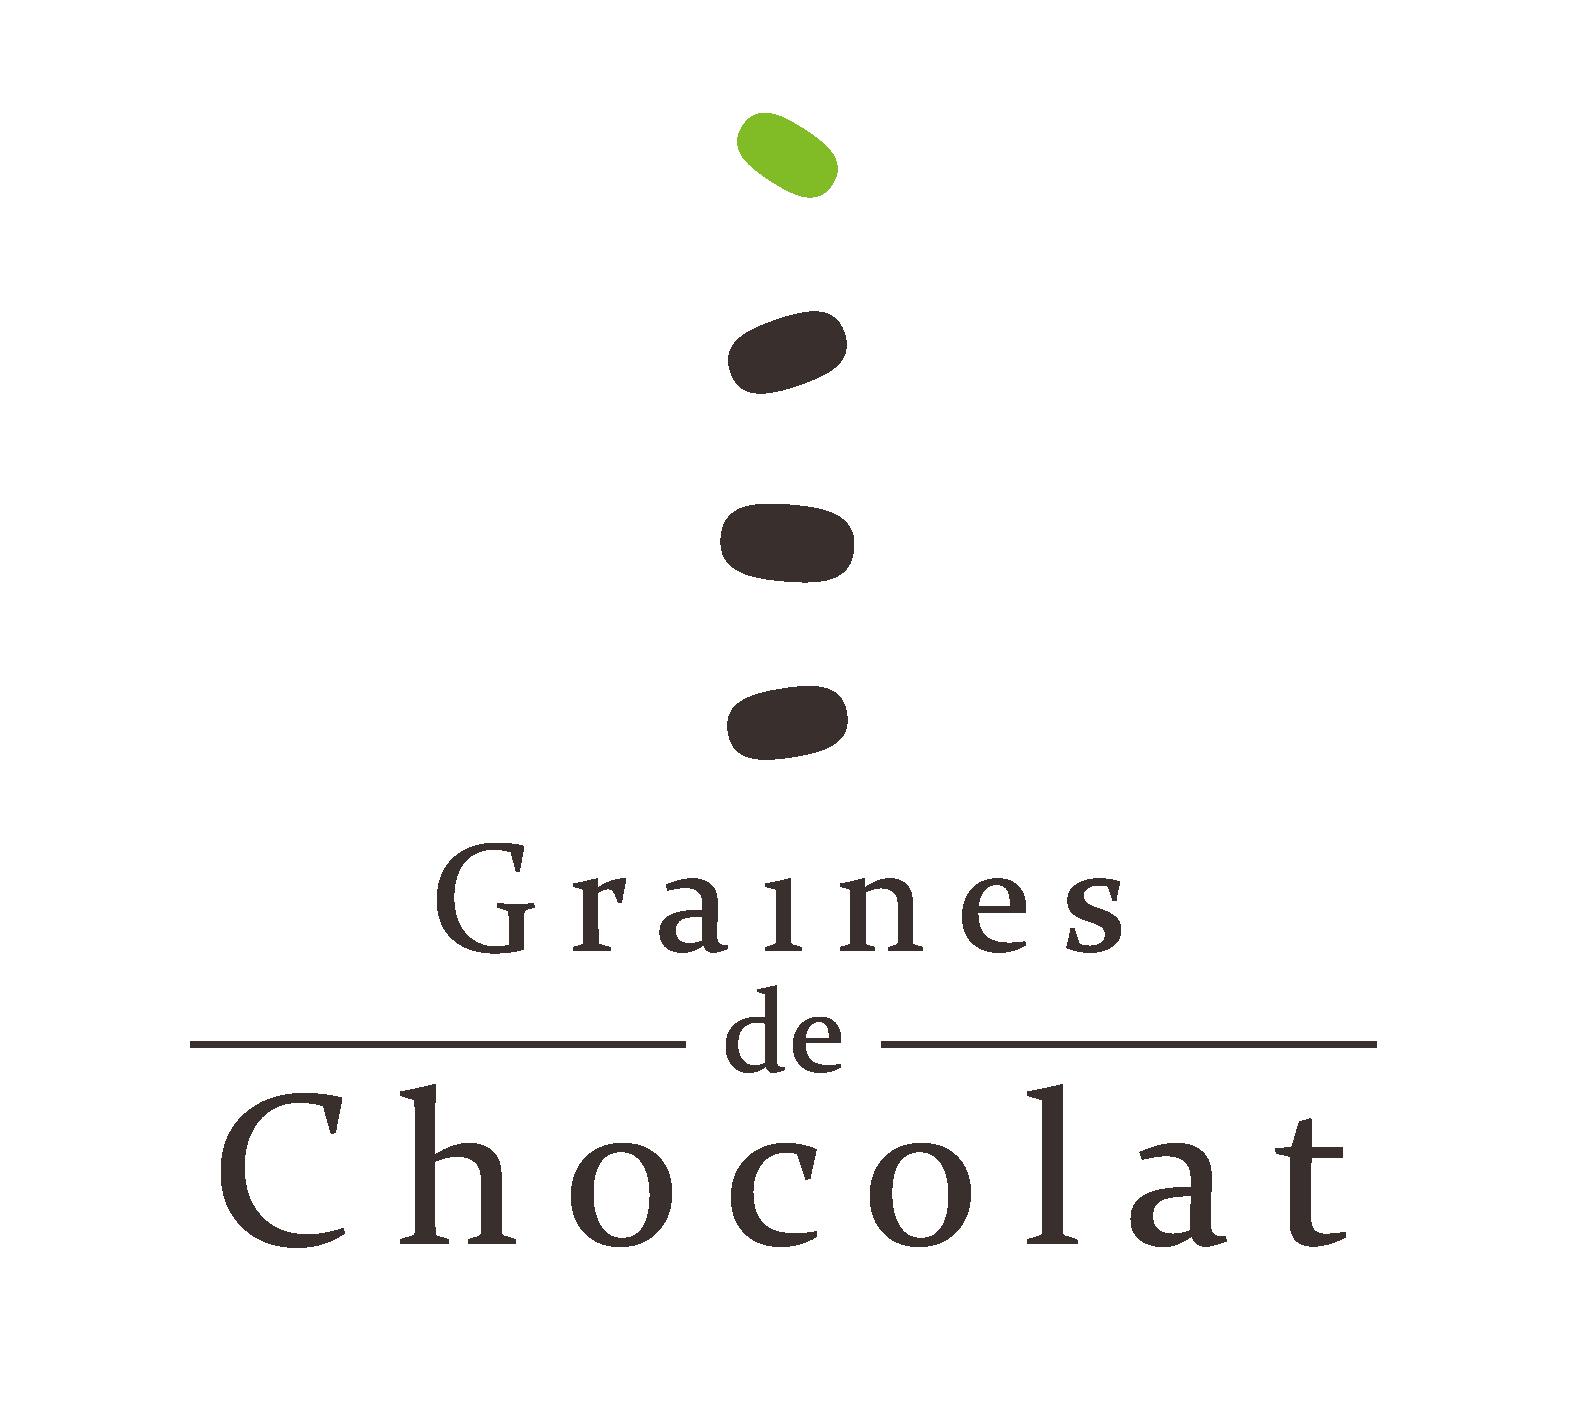 Graines de Chocolat logo